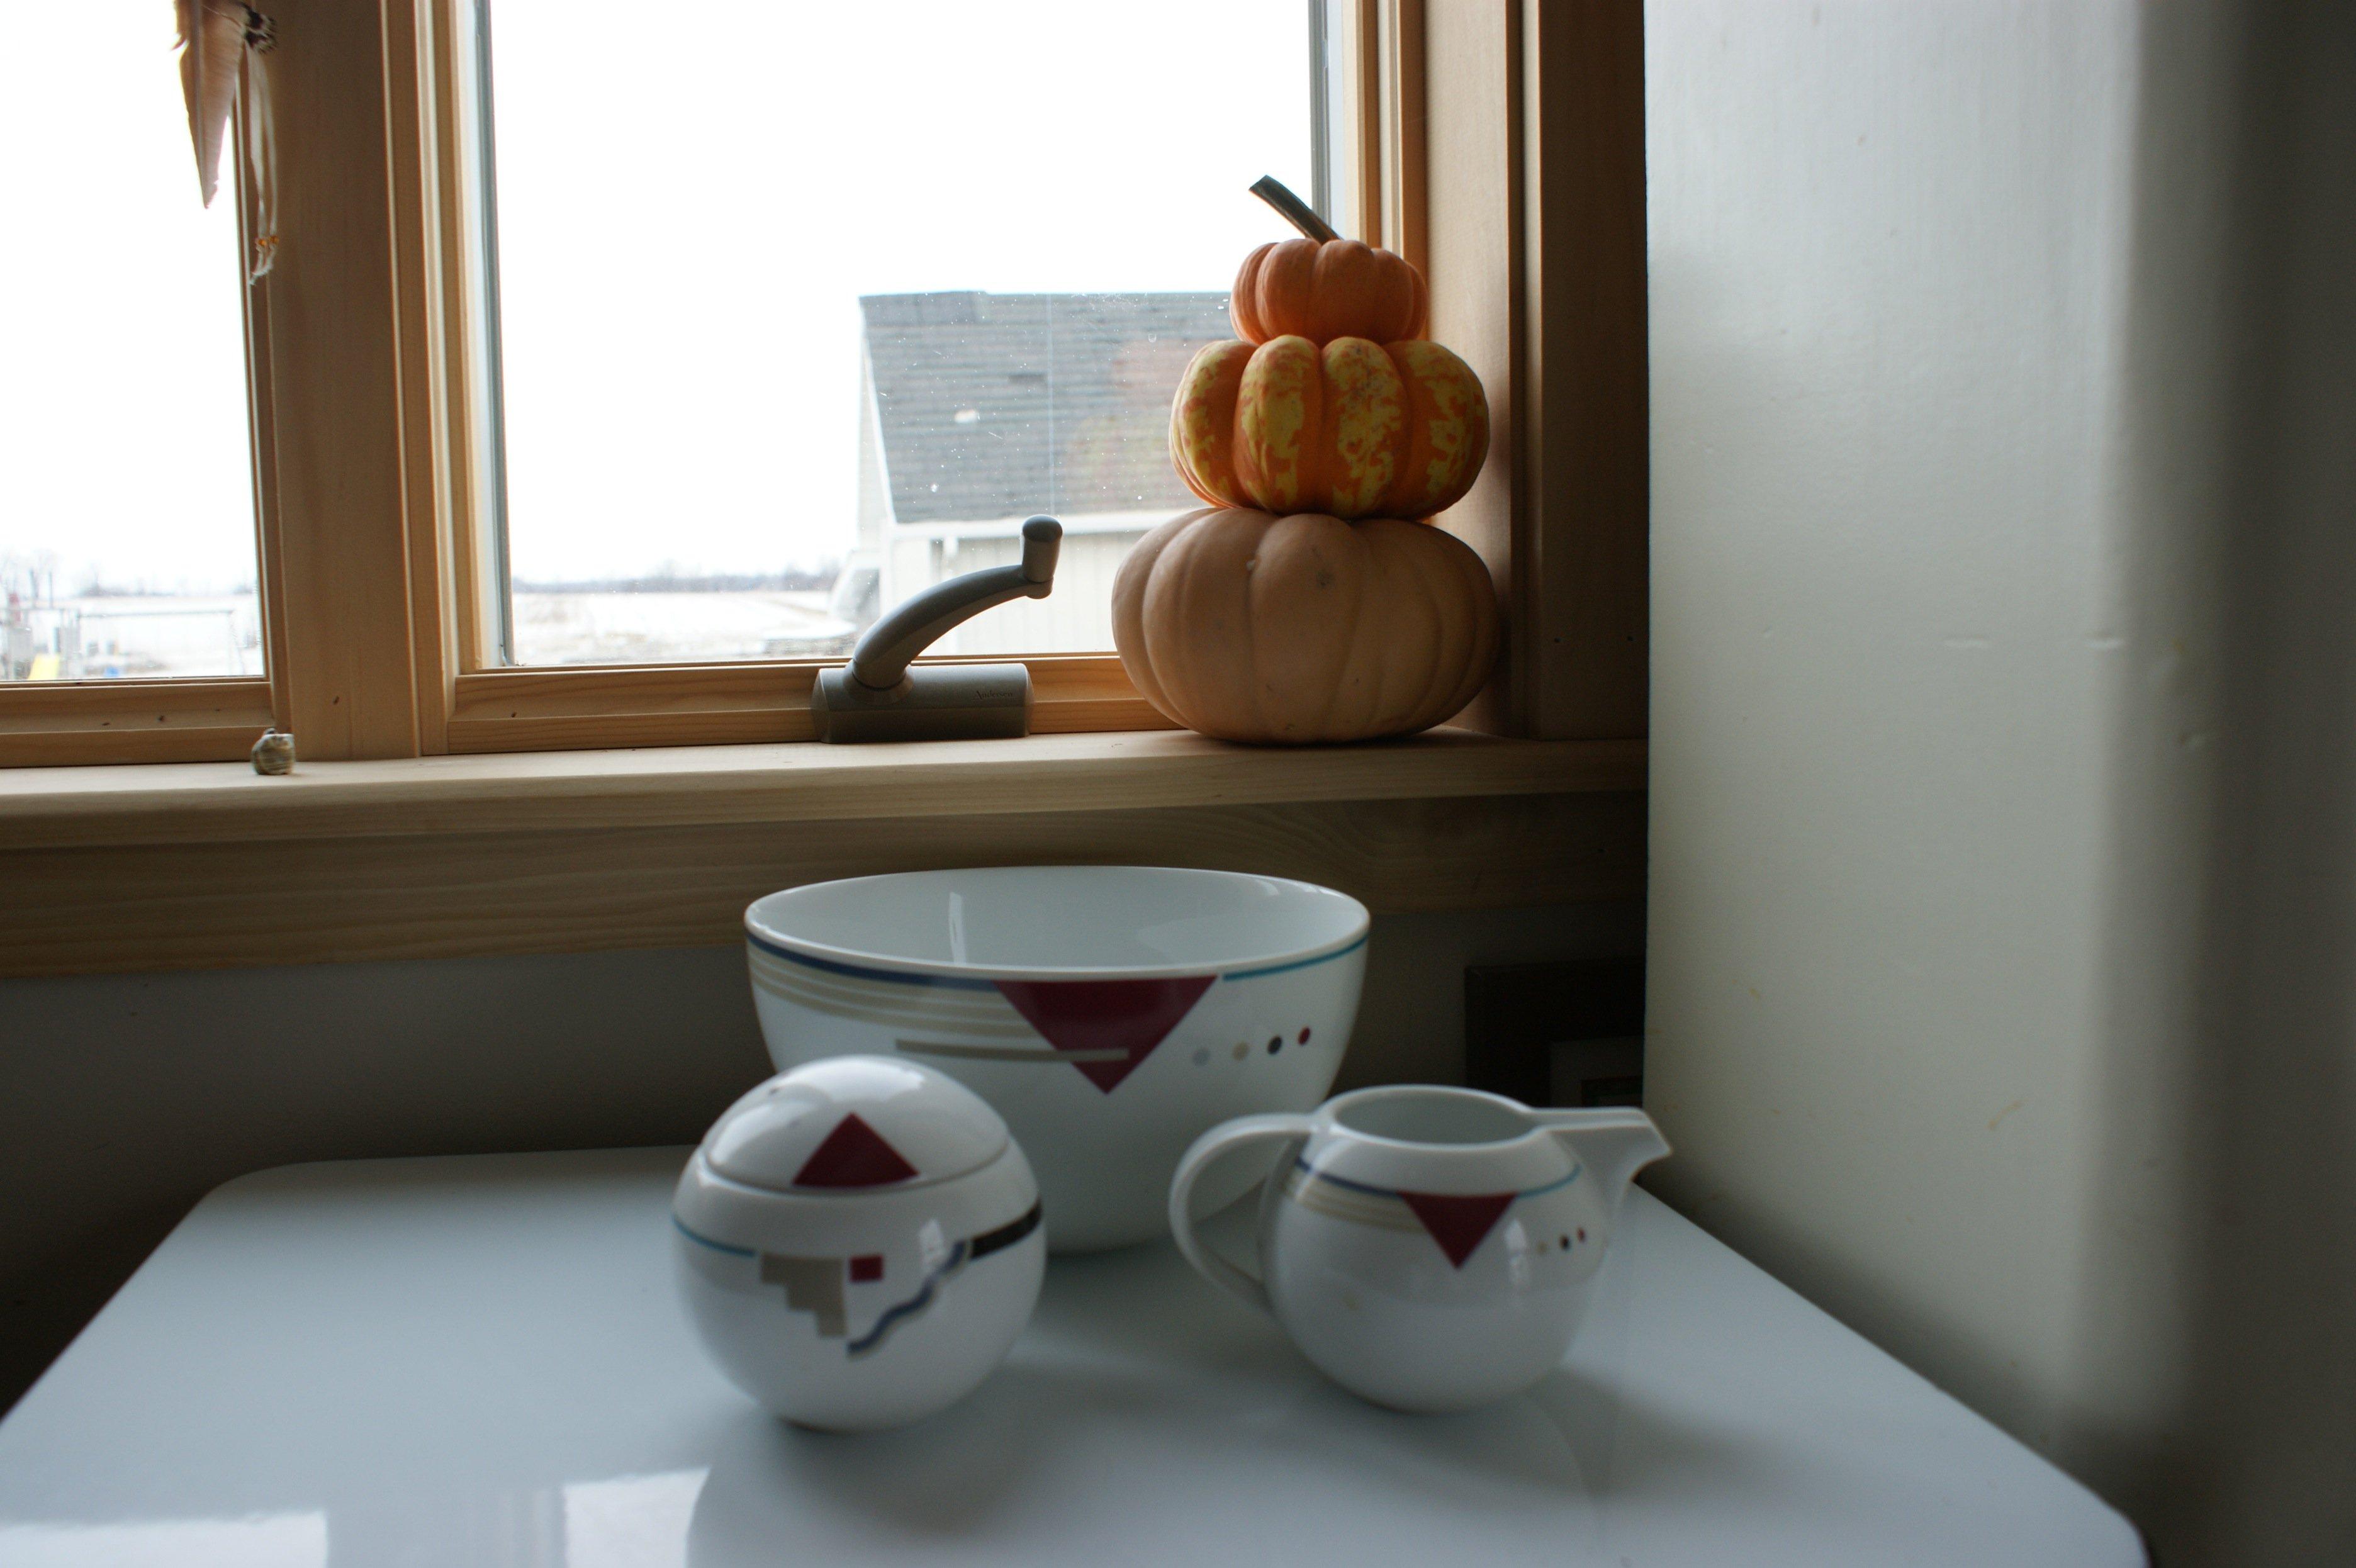 Corner of my kitchen